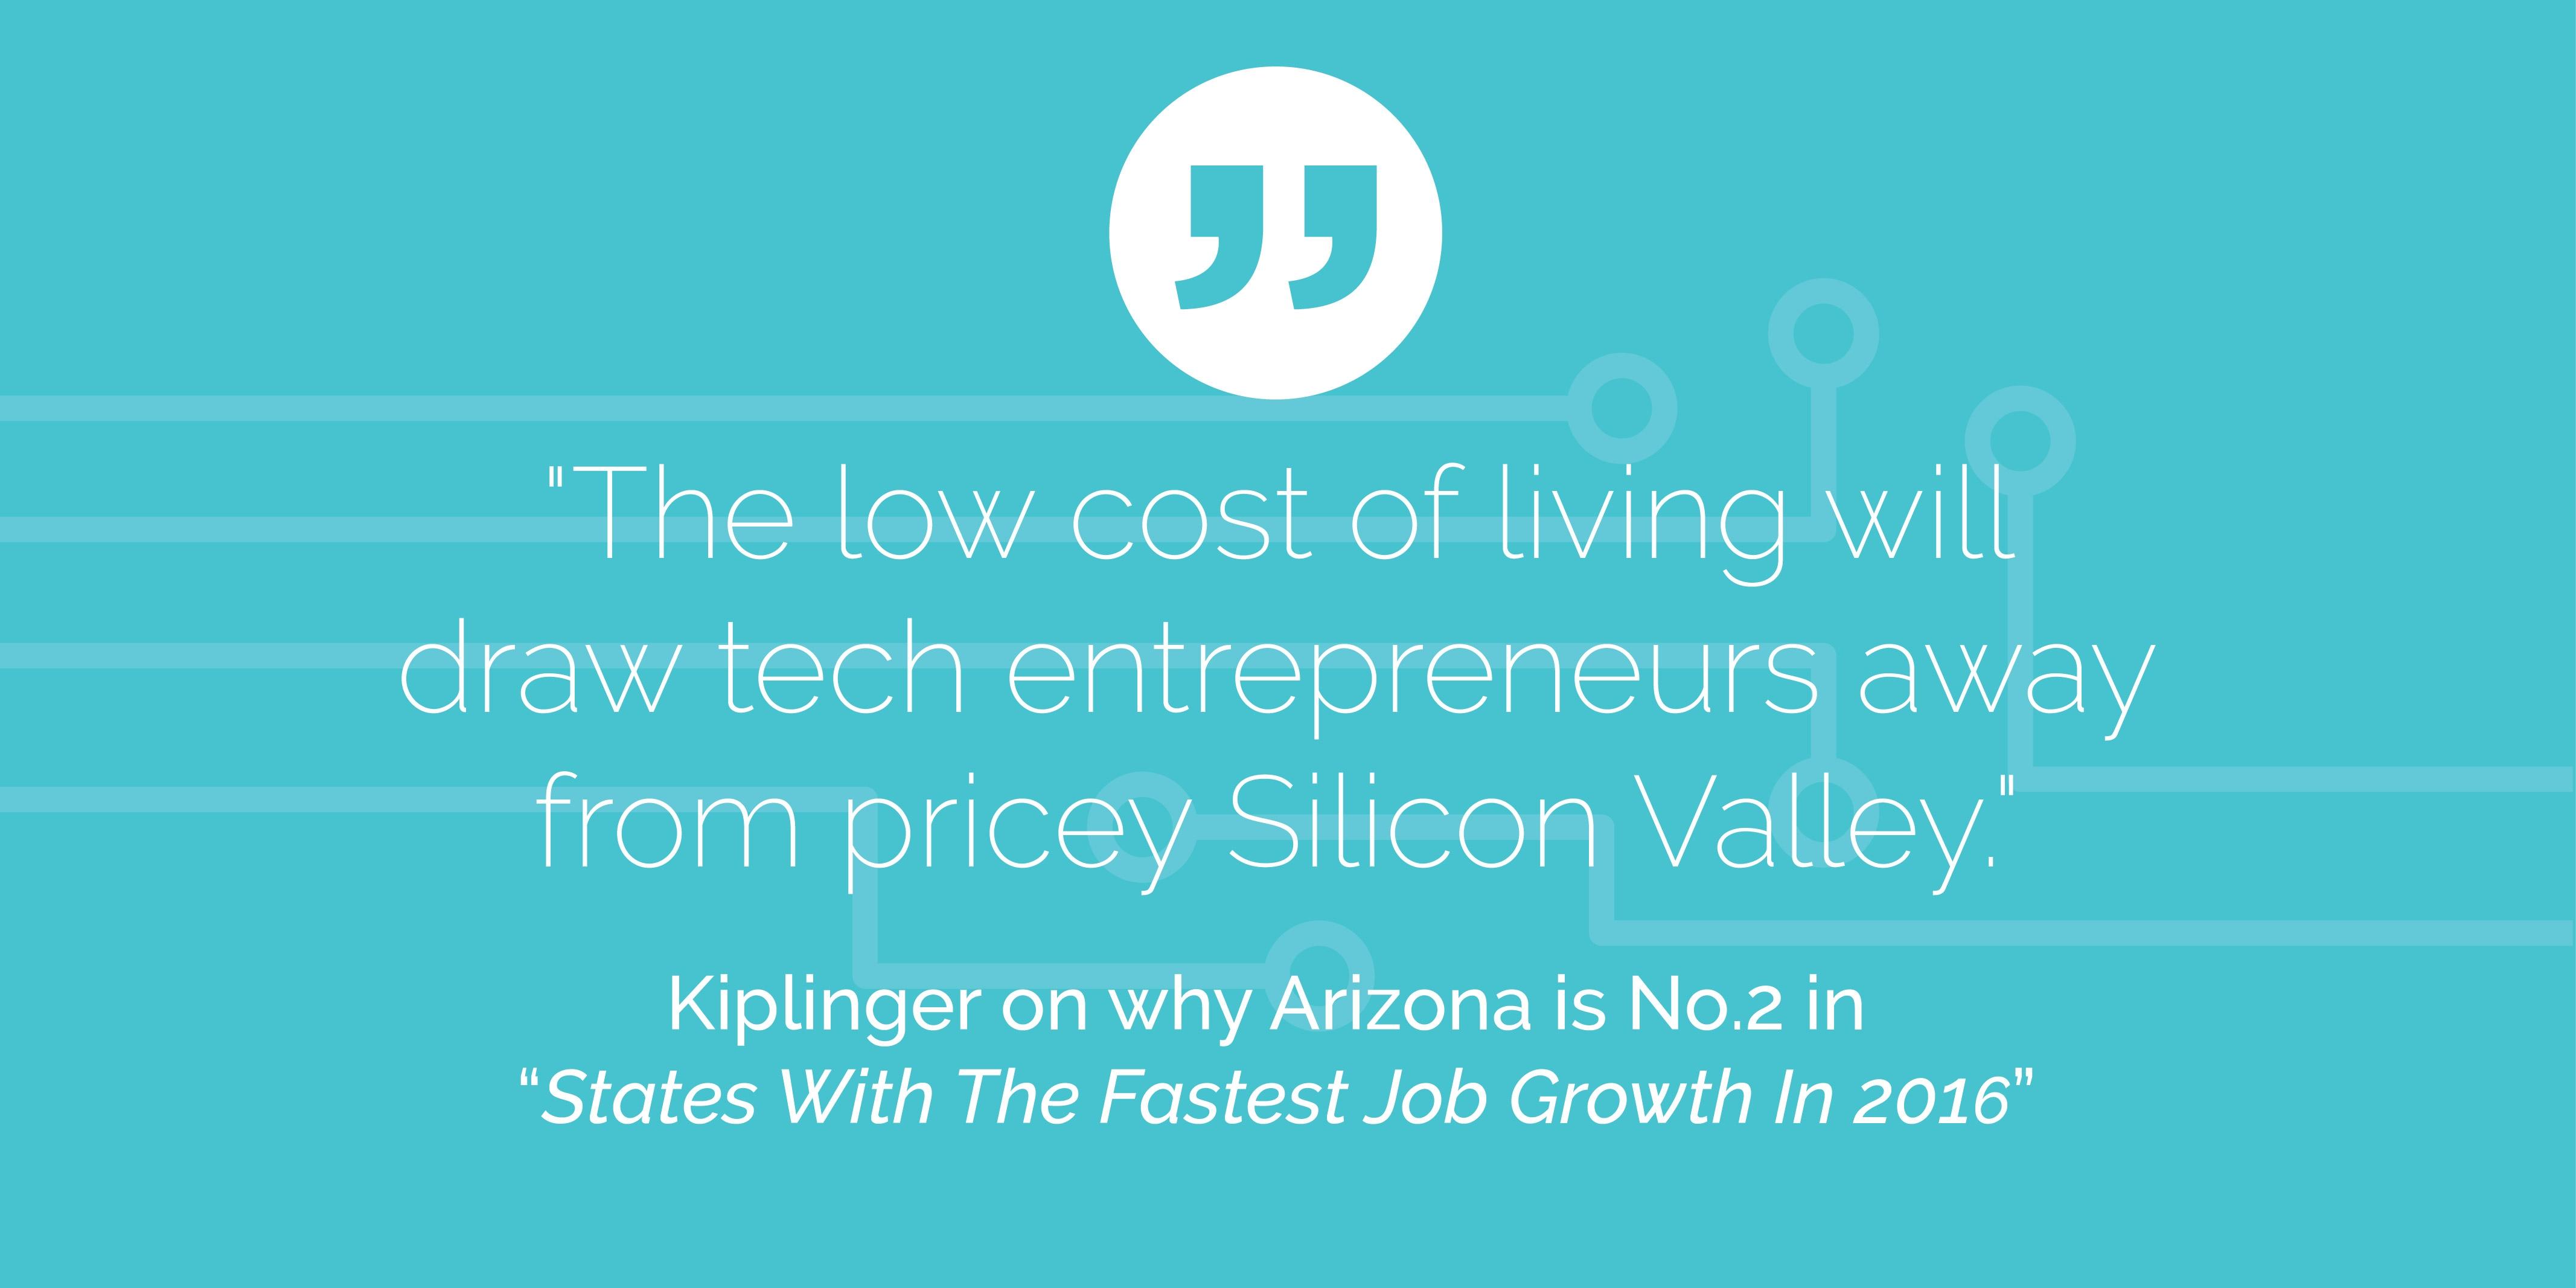 Arizona's Economy Is On The Rise   Office of the Arizona